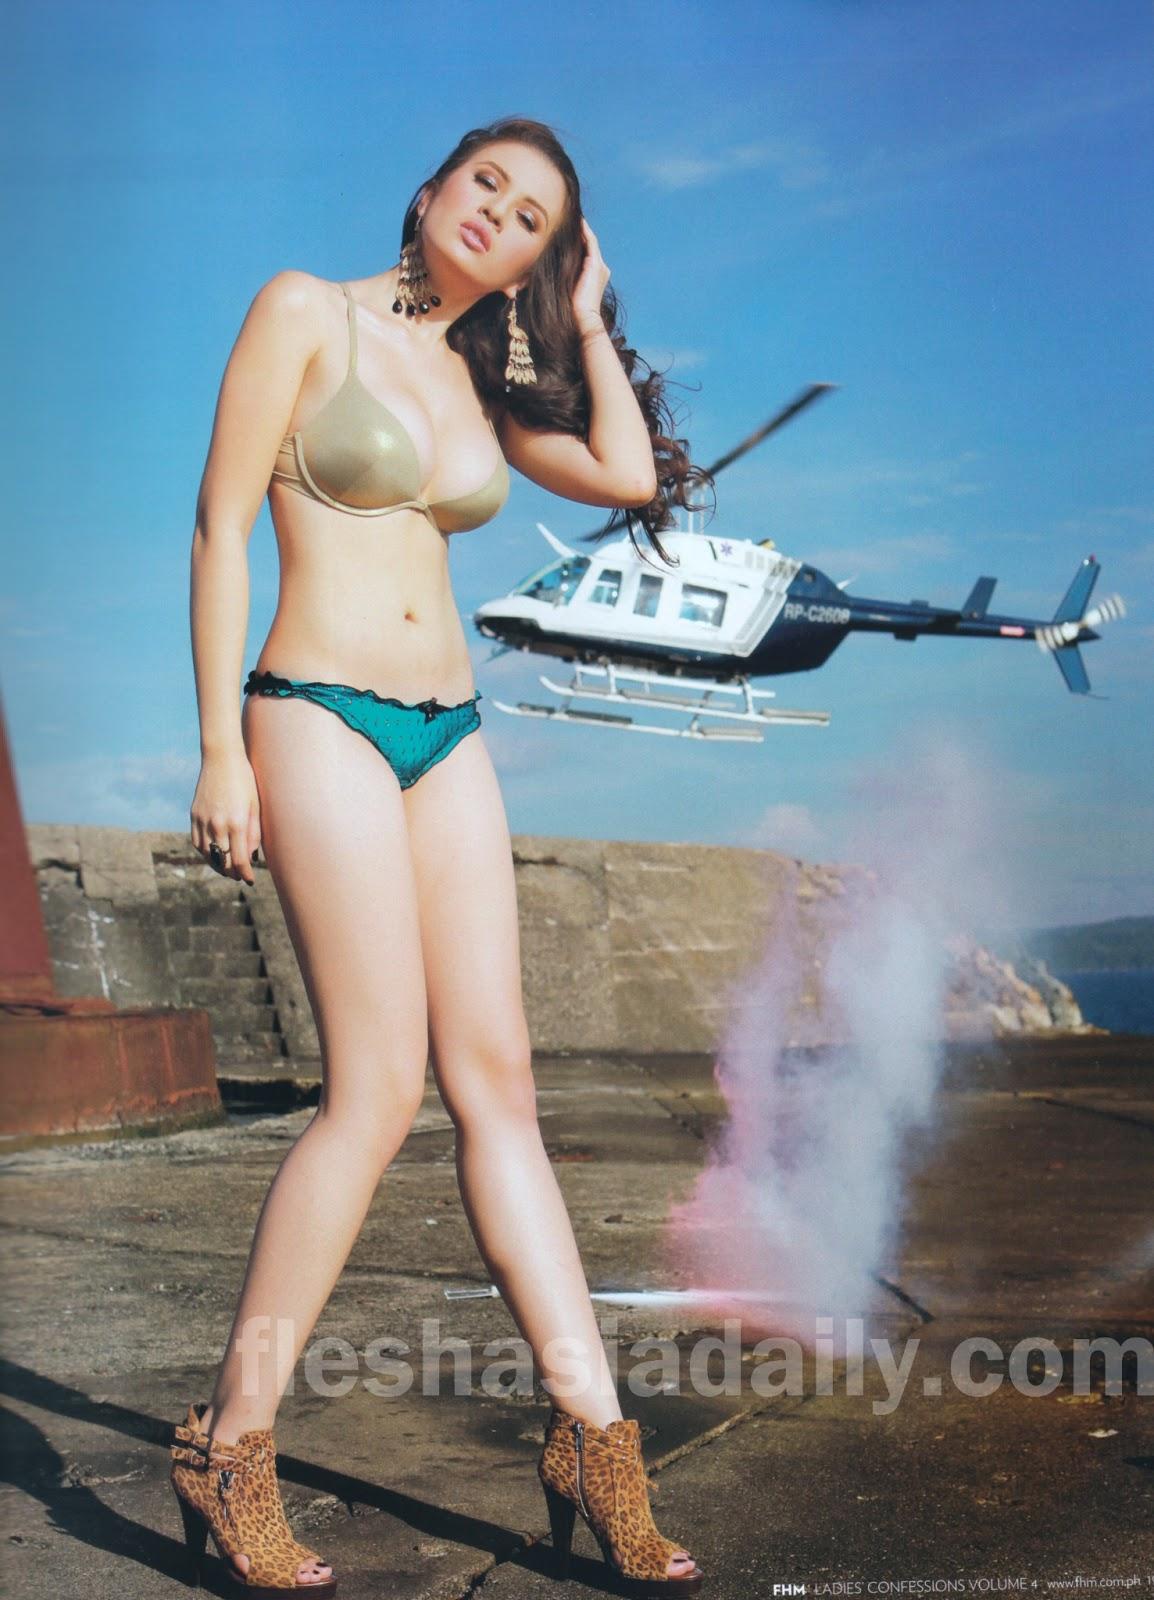 janna dominguez fhm bikini pics 3